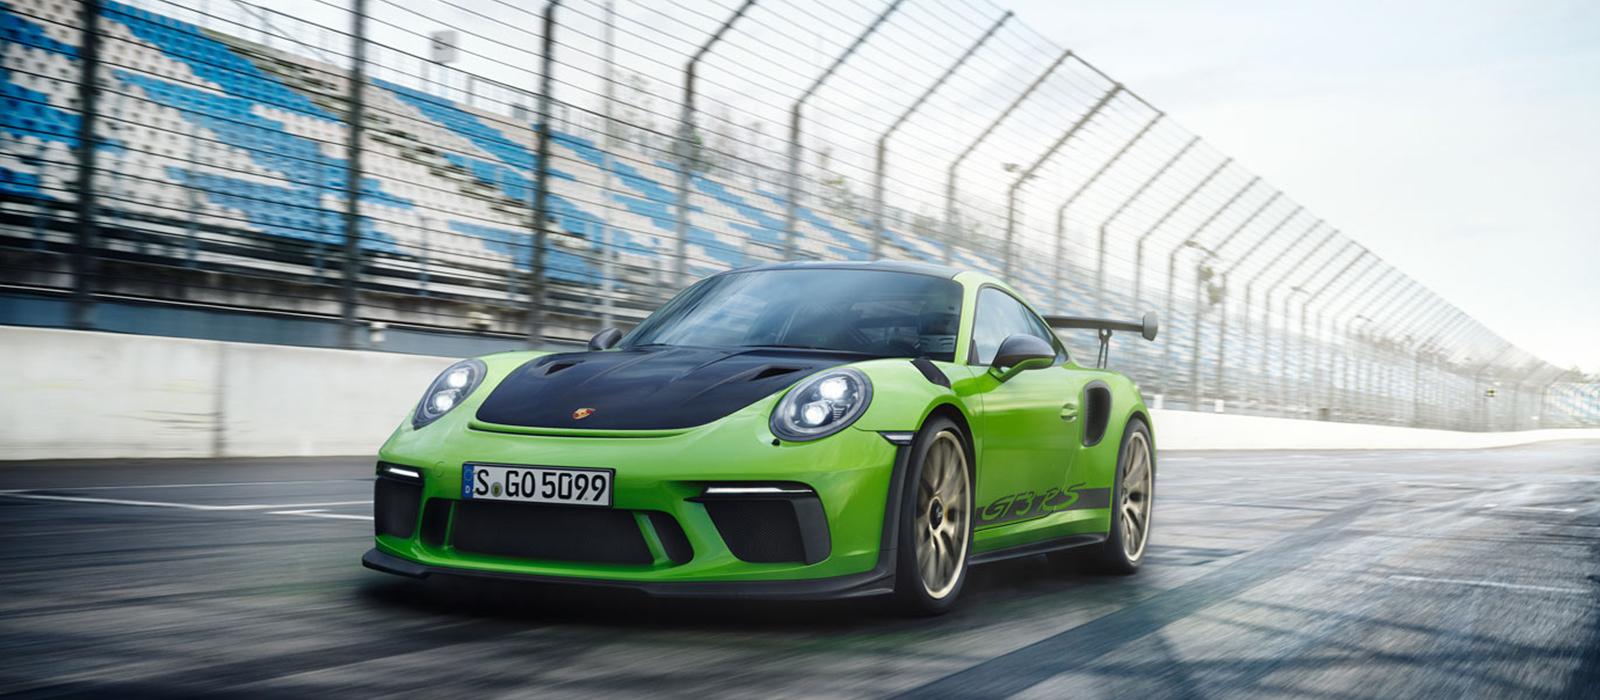 Porsche-Luxury-Car-Insurance-Ferrari-GT3RS-Wealth-Asset-Protection.jpg